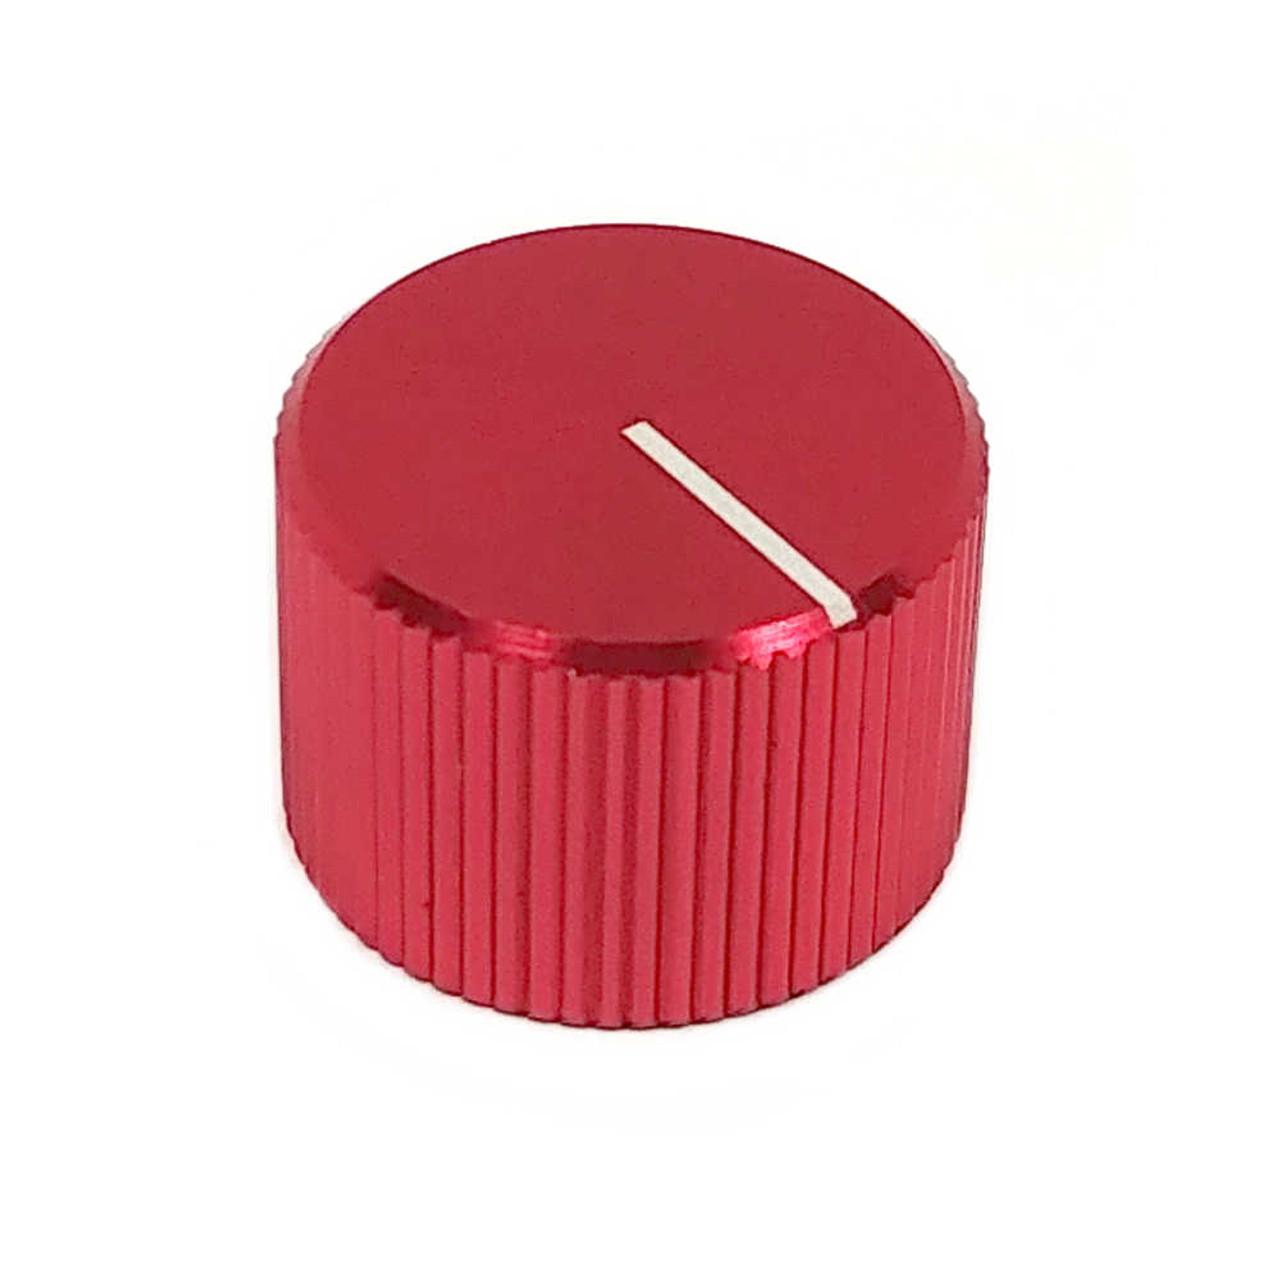 Anodized Aluminum Knob - Red